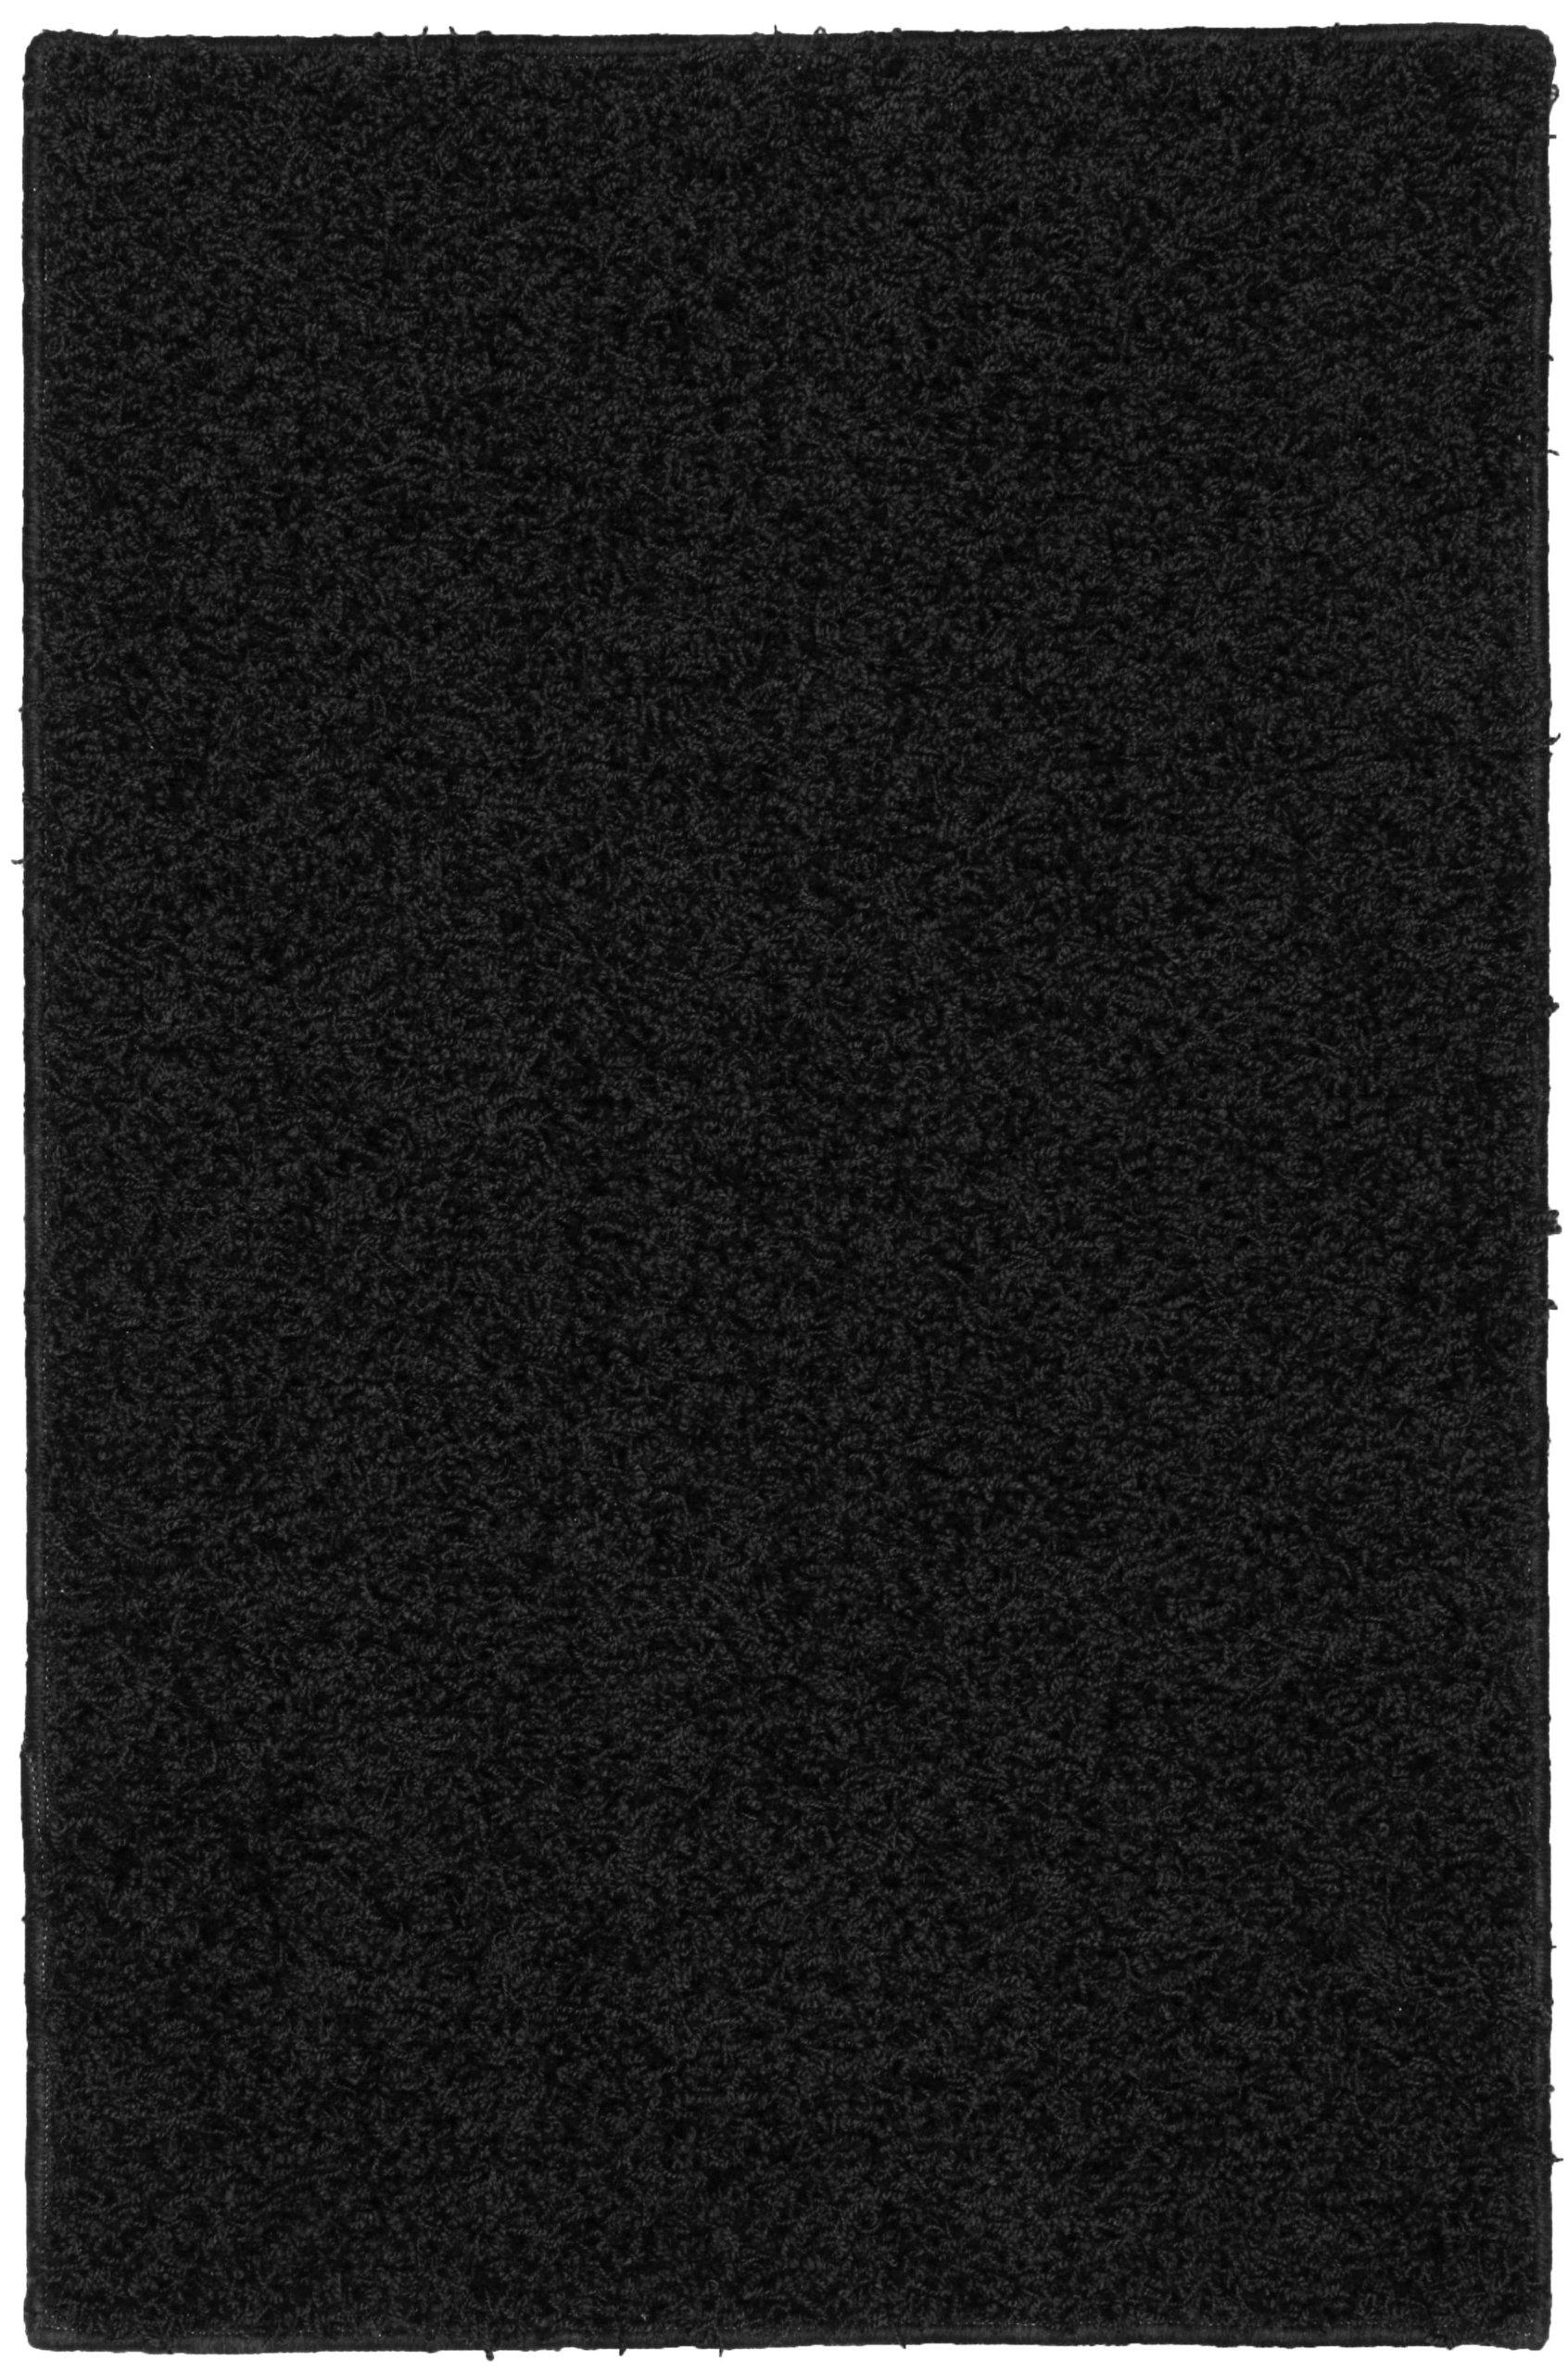 Garland Rug Southpointe Shag Area Rug, 3-Feet by 5-Feet, Black by Garland Rug (Image #1)